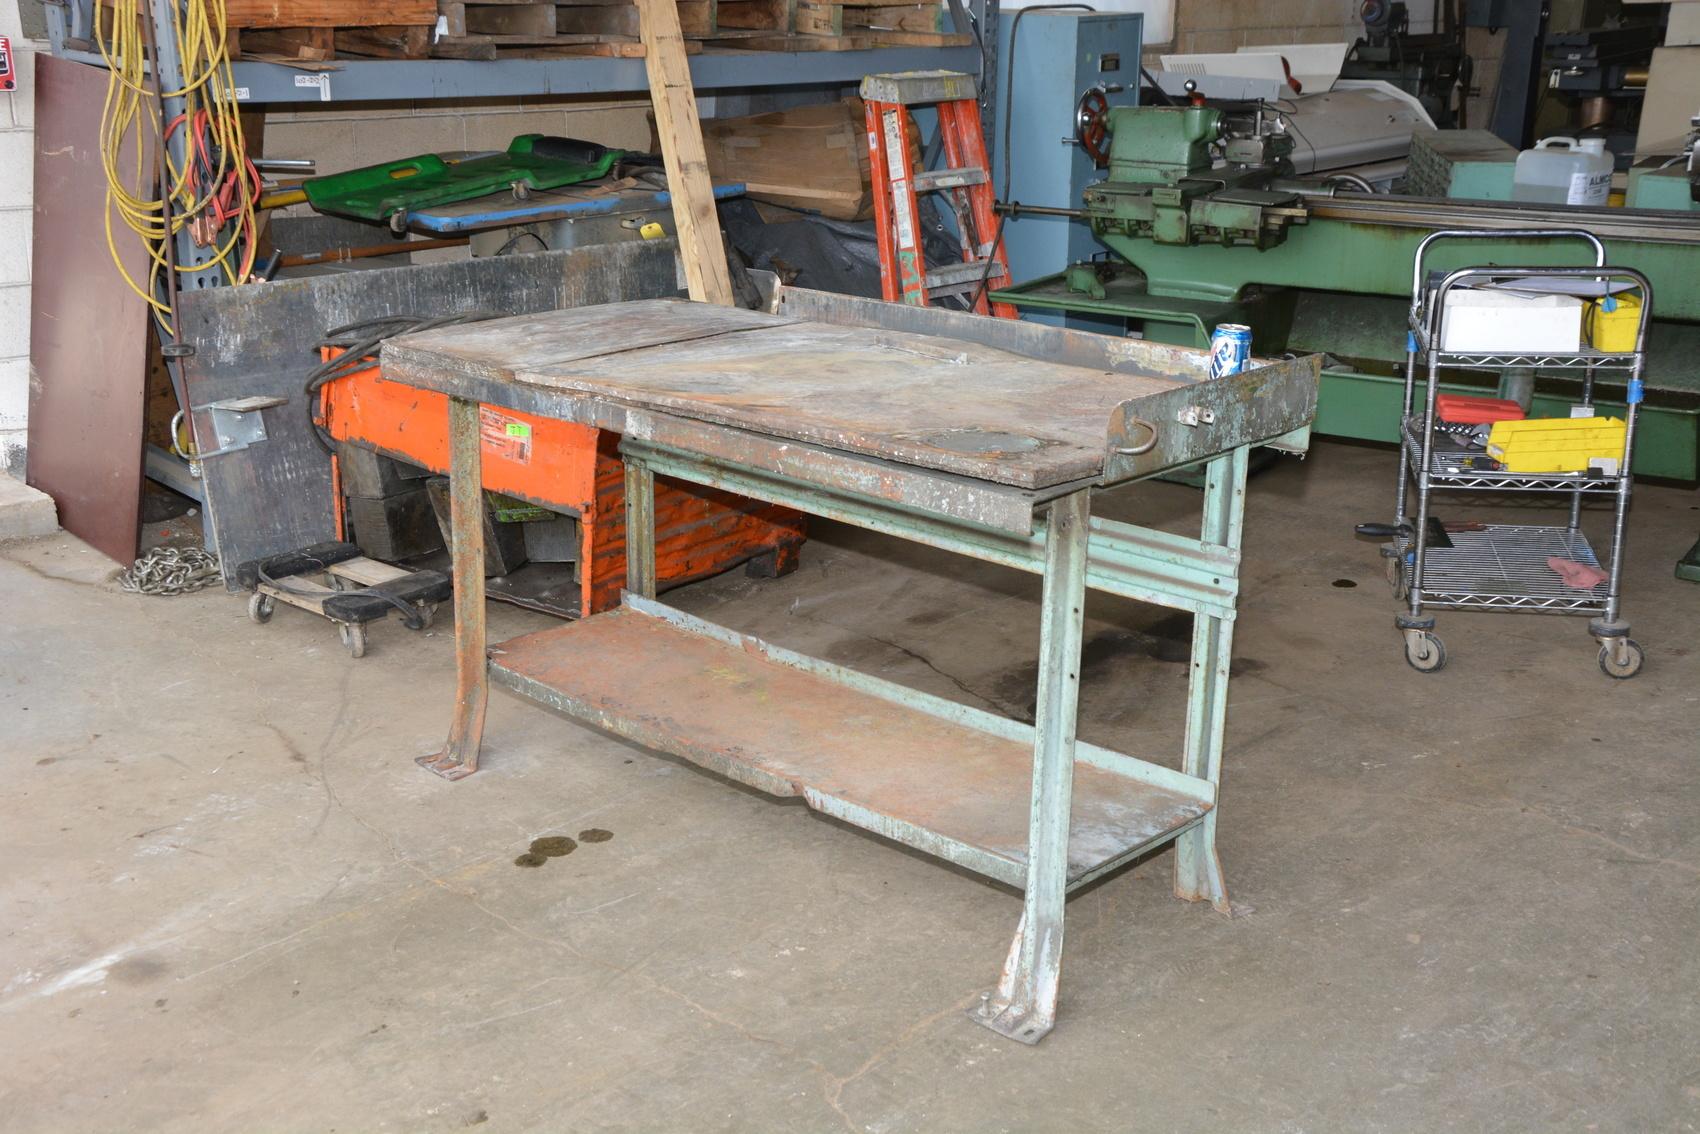 Heavy Duty Industrial Work Bench Workbench Table 60x29x36 Equipto Lyon